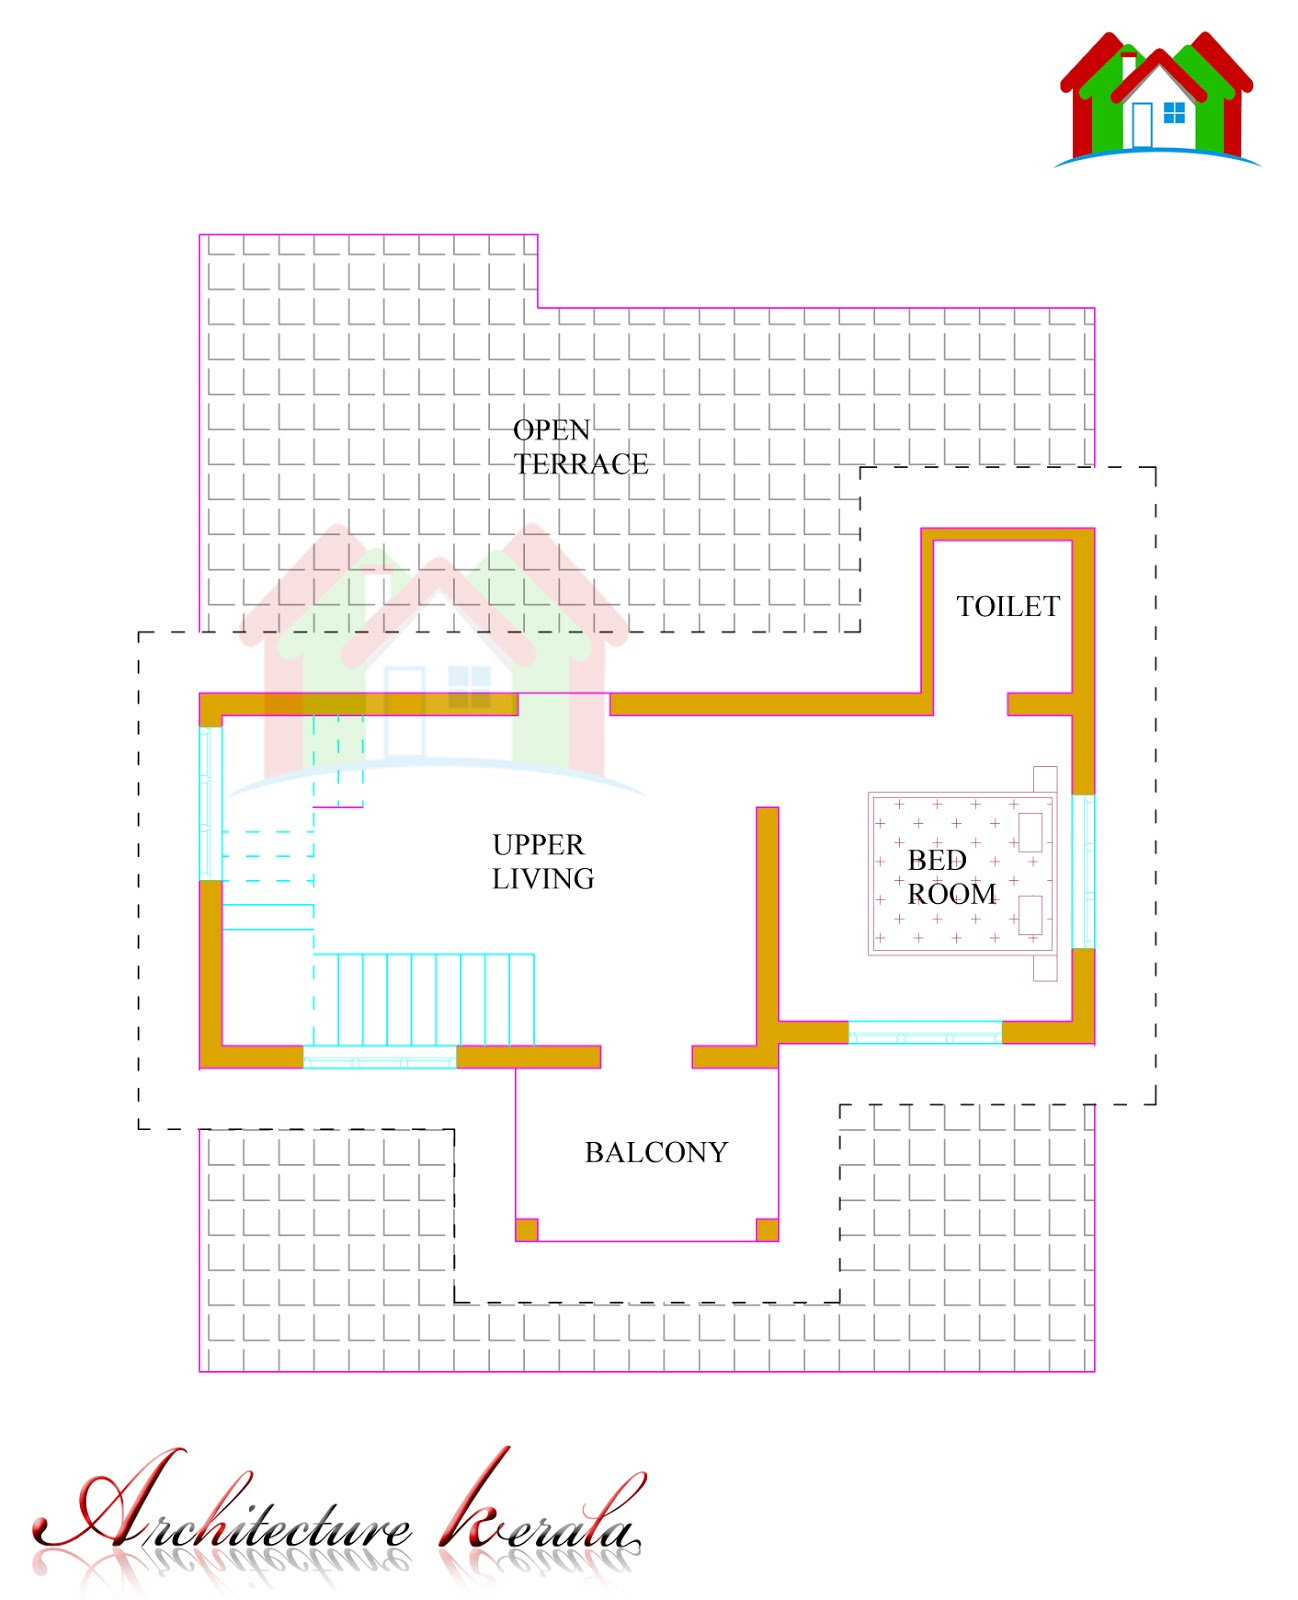 Unique house plans 1500 square feet house floor ideas for Best home designs under 1500 square feet